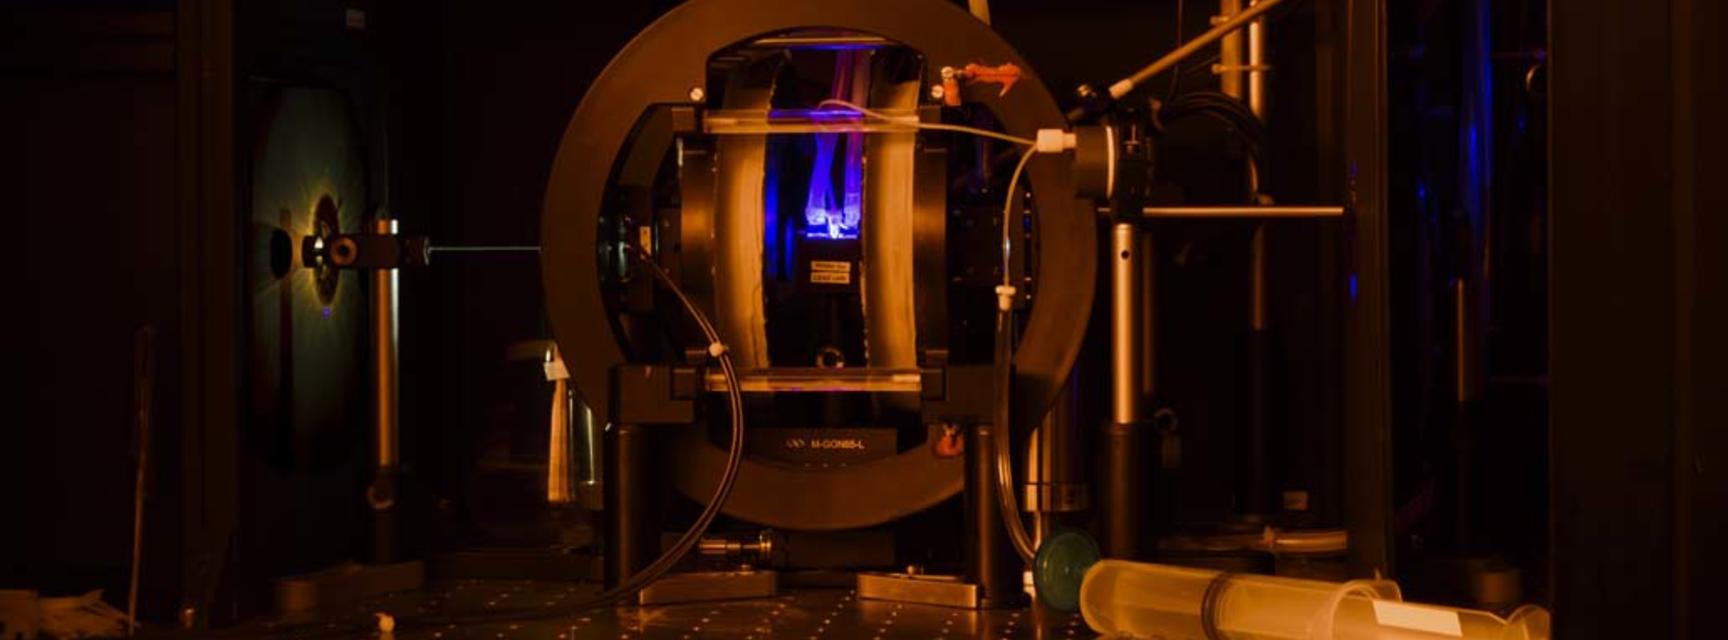 Photo of Broadband Cavity Enhanced Absorption Spectroscopy